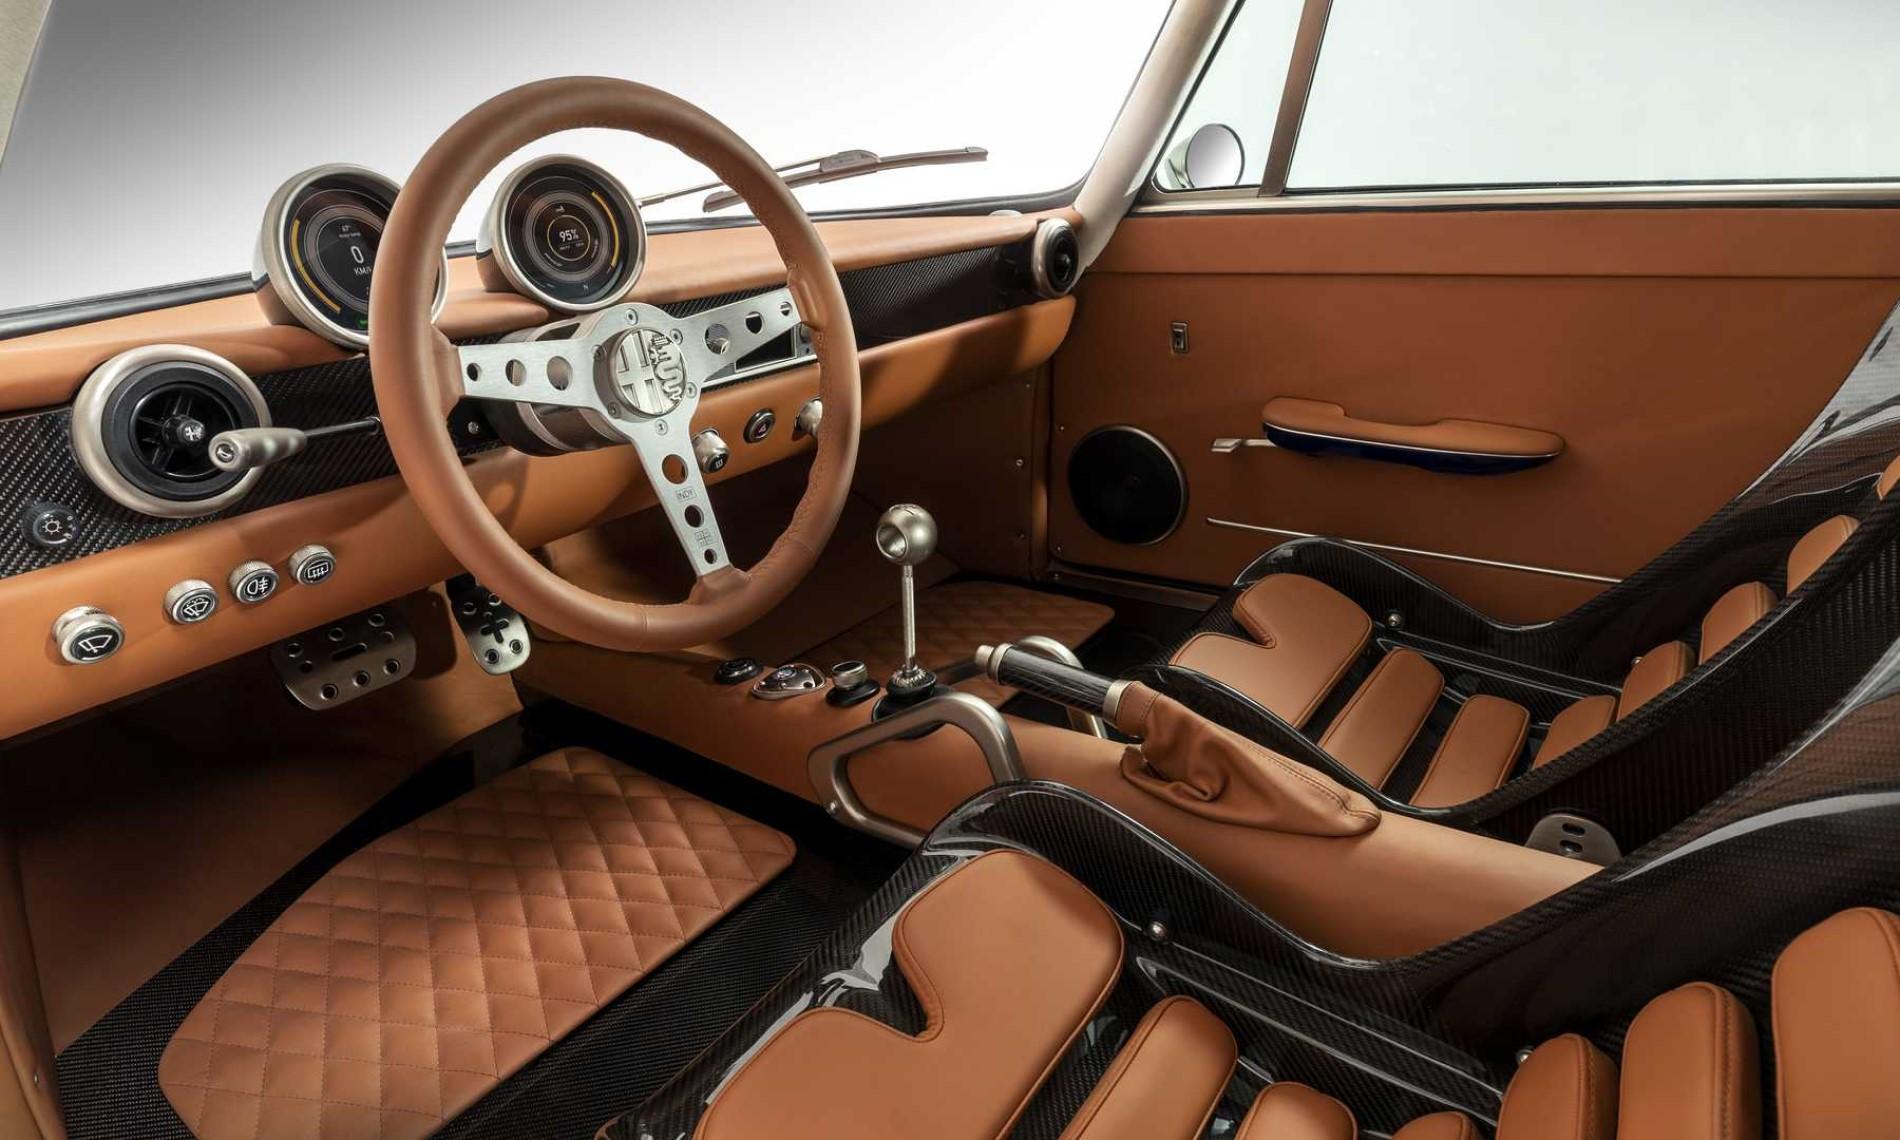 Totem Automobili Electric Alfa Romeo GT interior